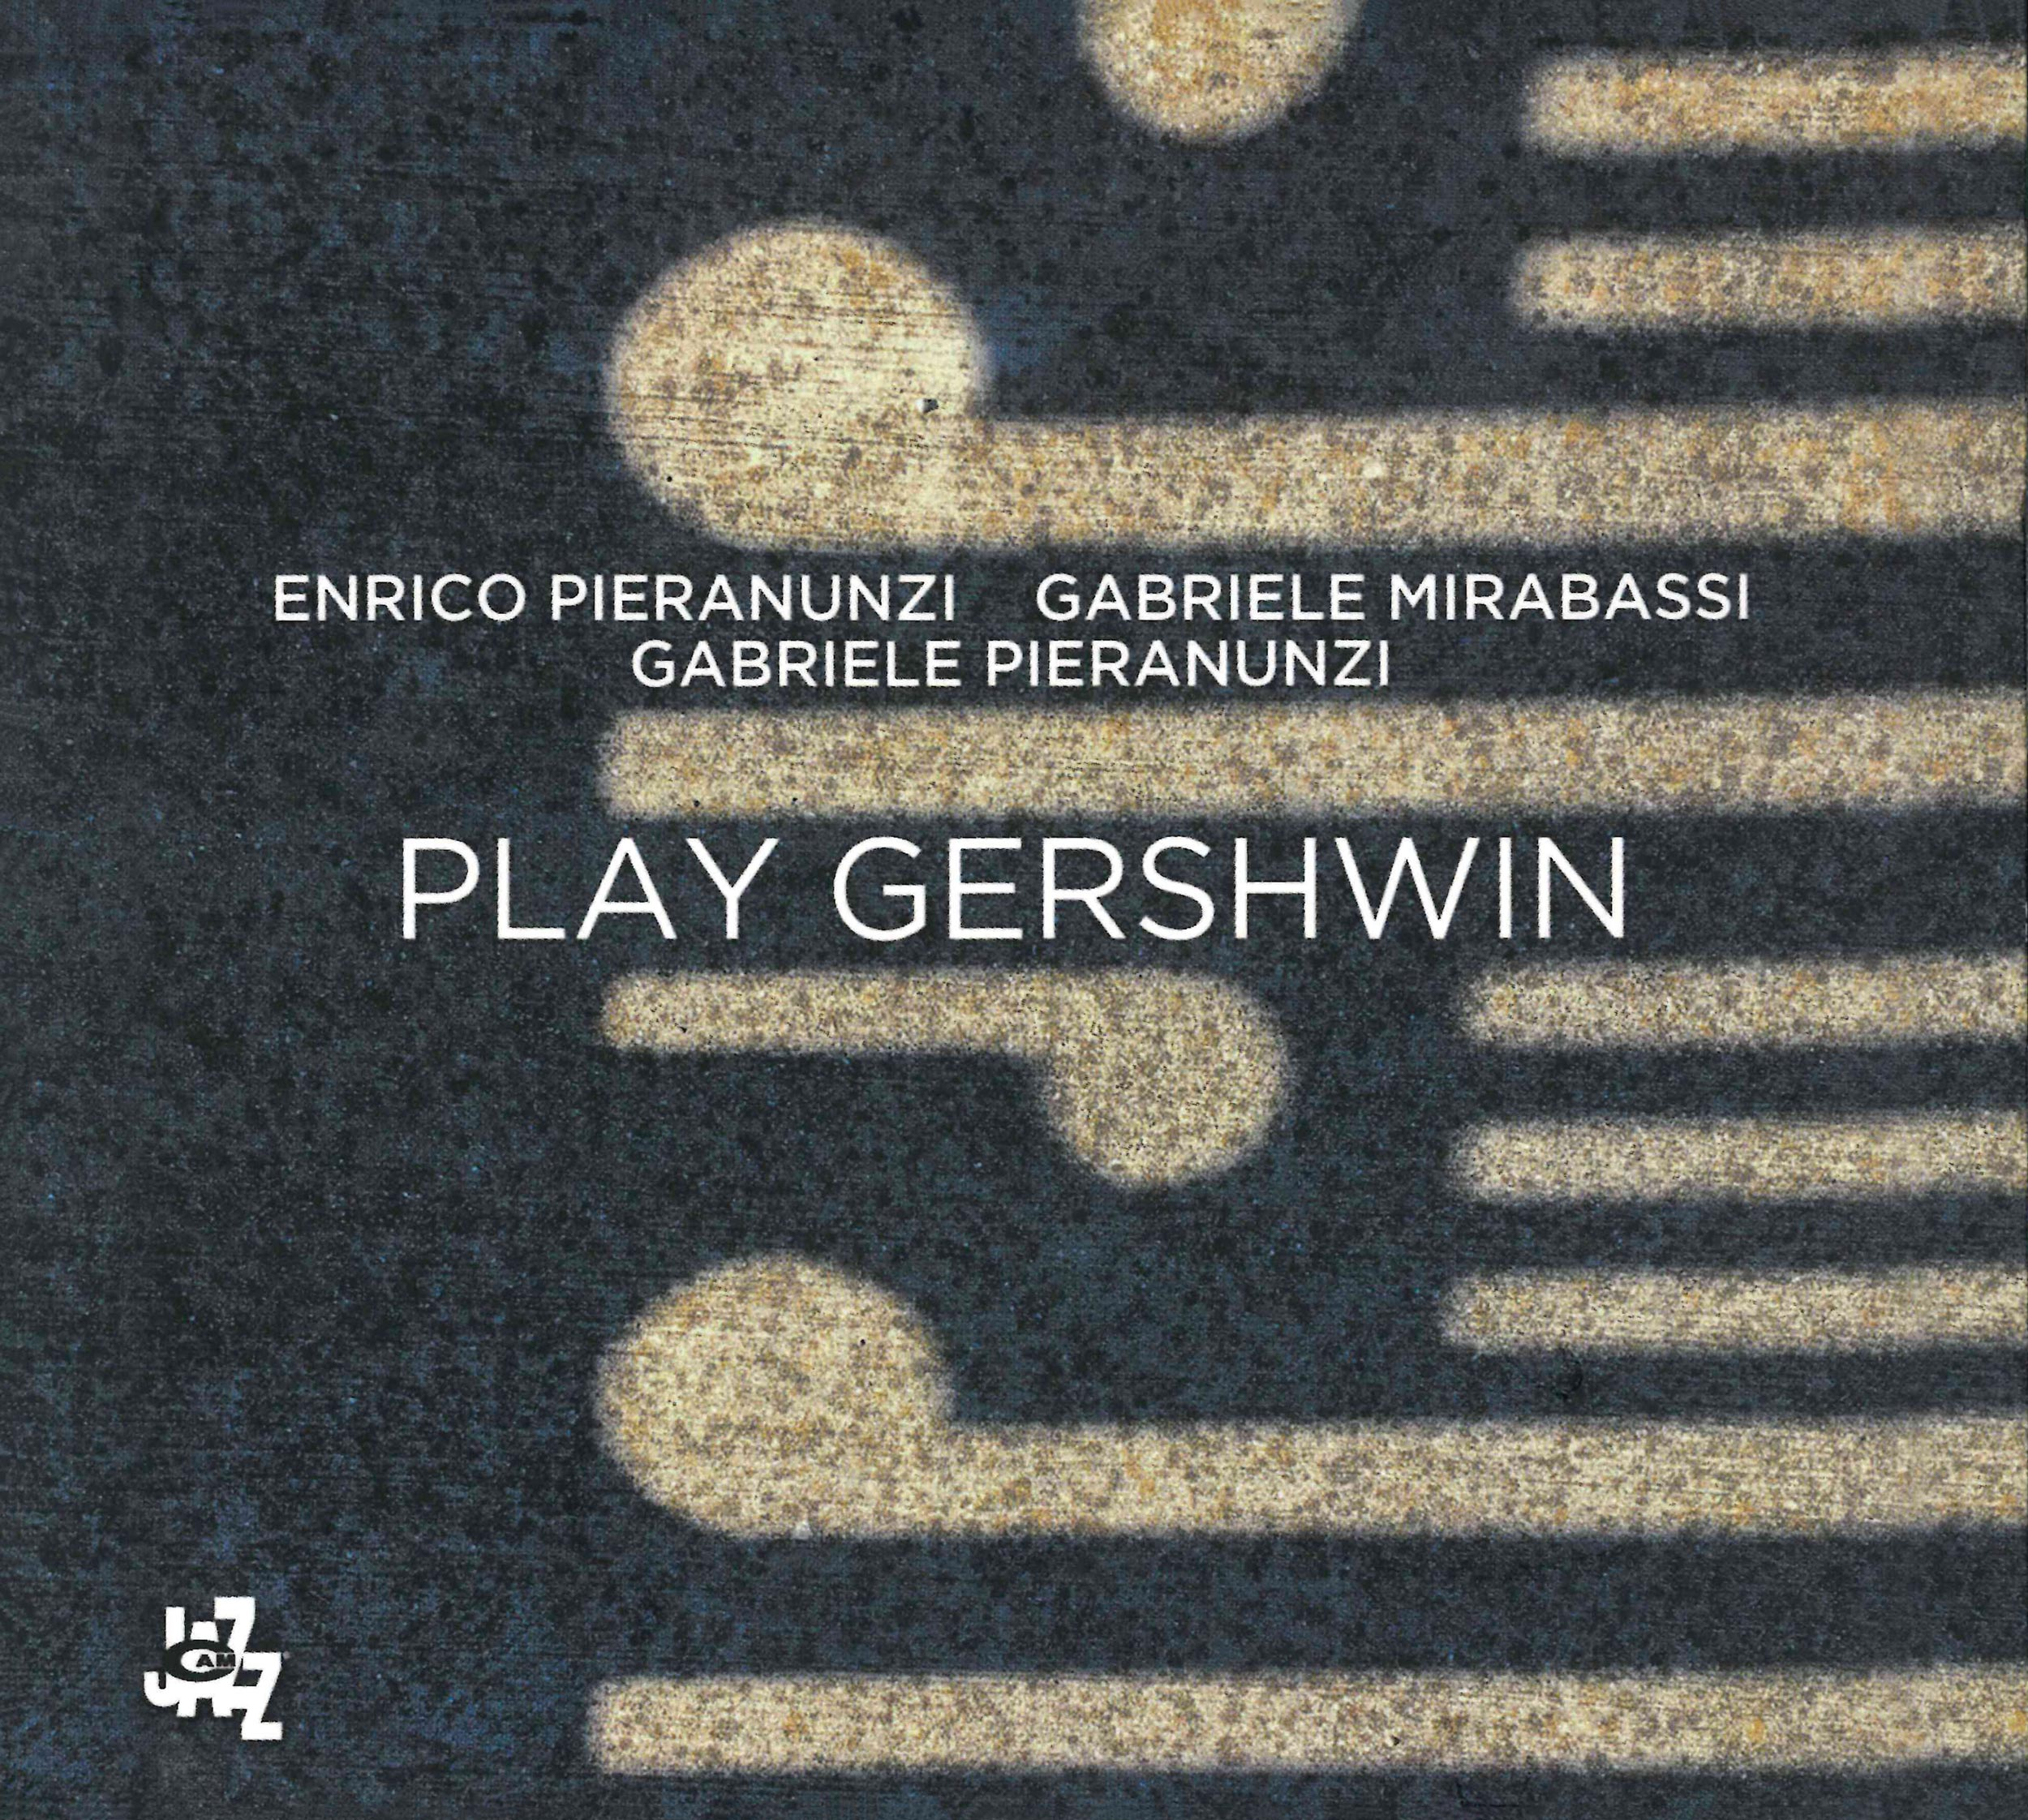 PLAY GERSHWIN CD COVER - ENRICO PIERANUNZI